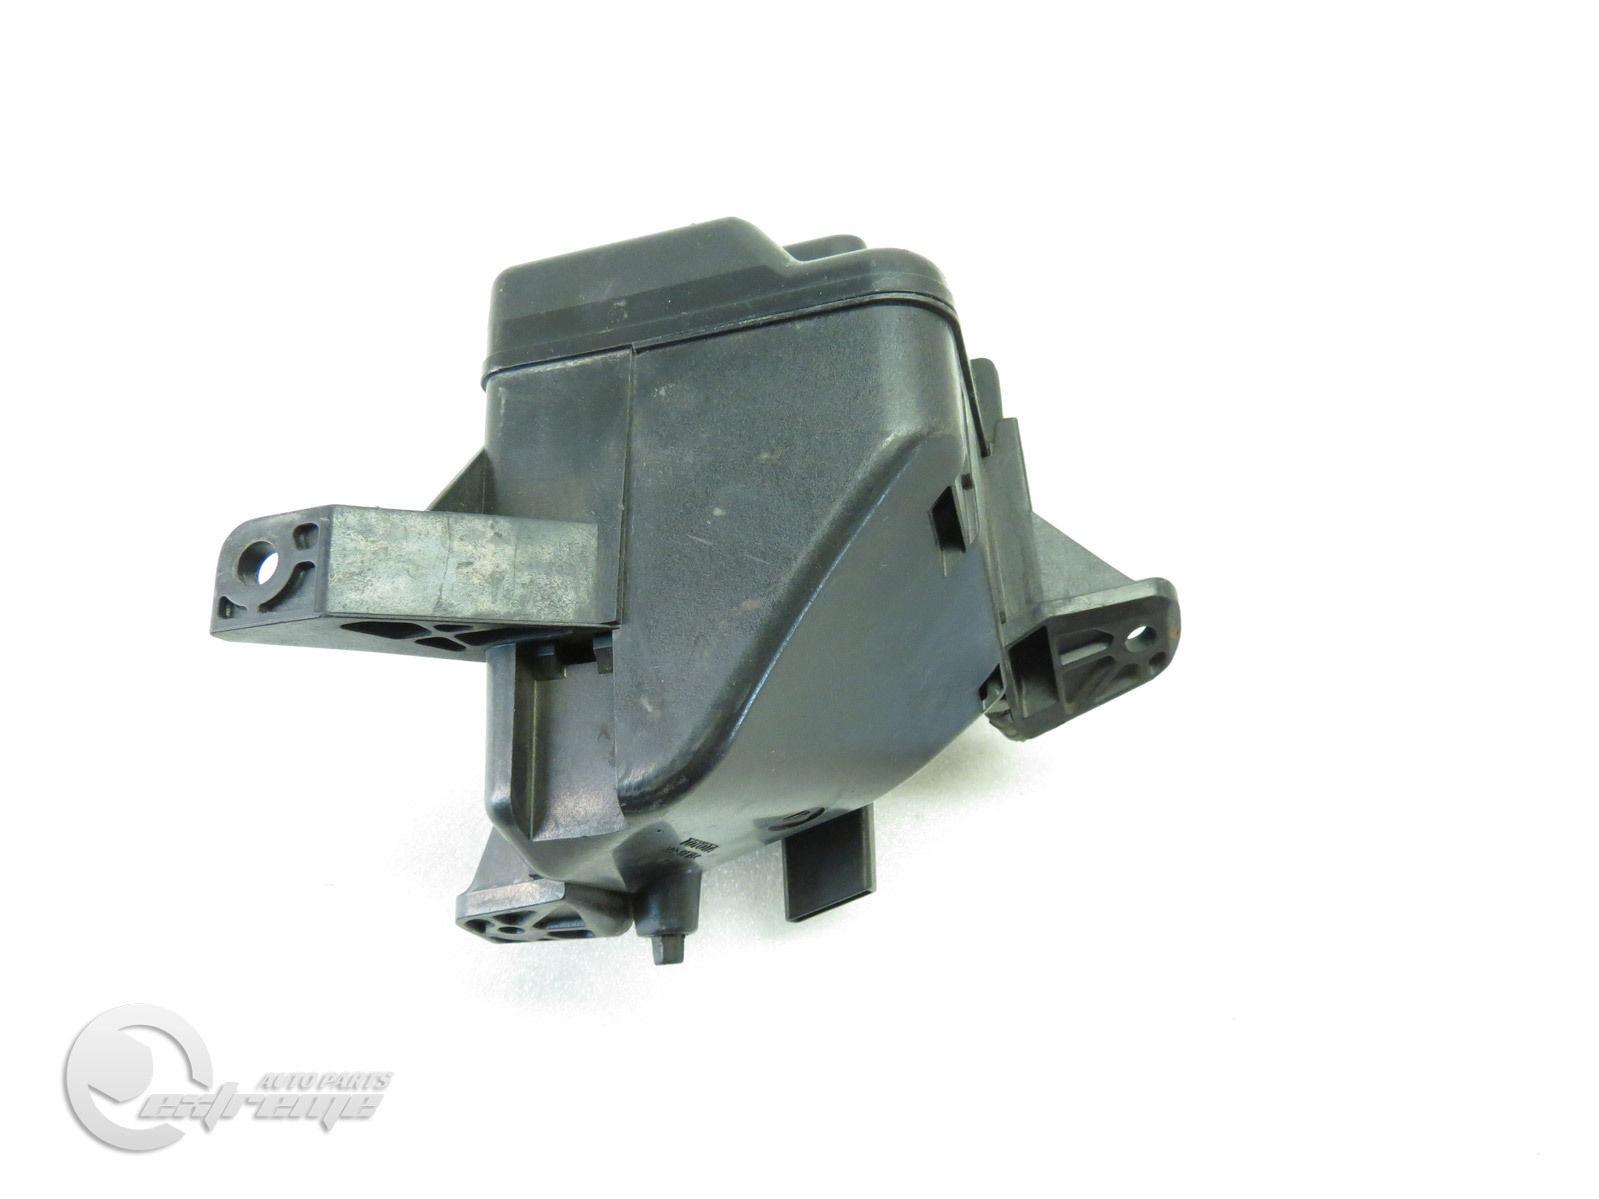 ... Scion tC 05-07 Engine Bay Relay Fuse Box, Under Hood 82730-21060